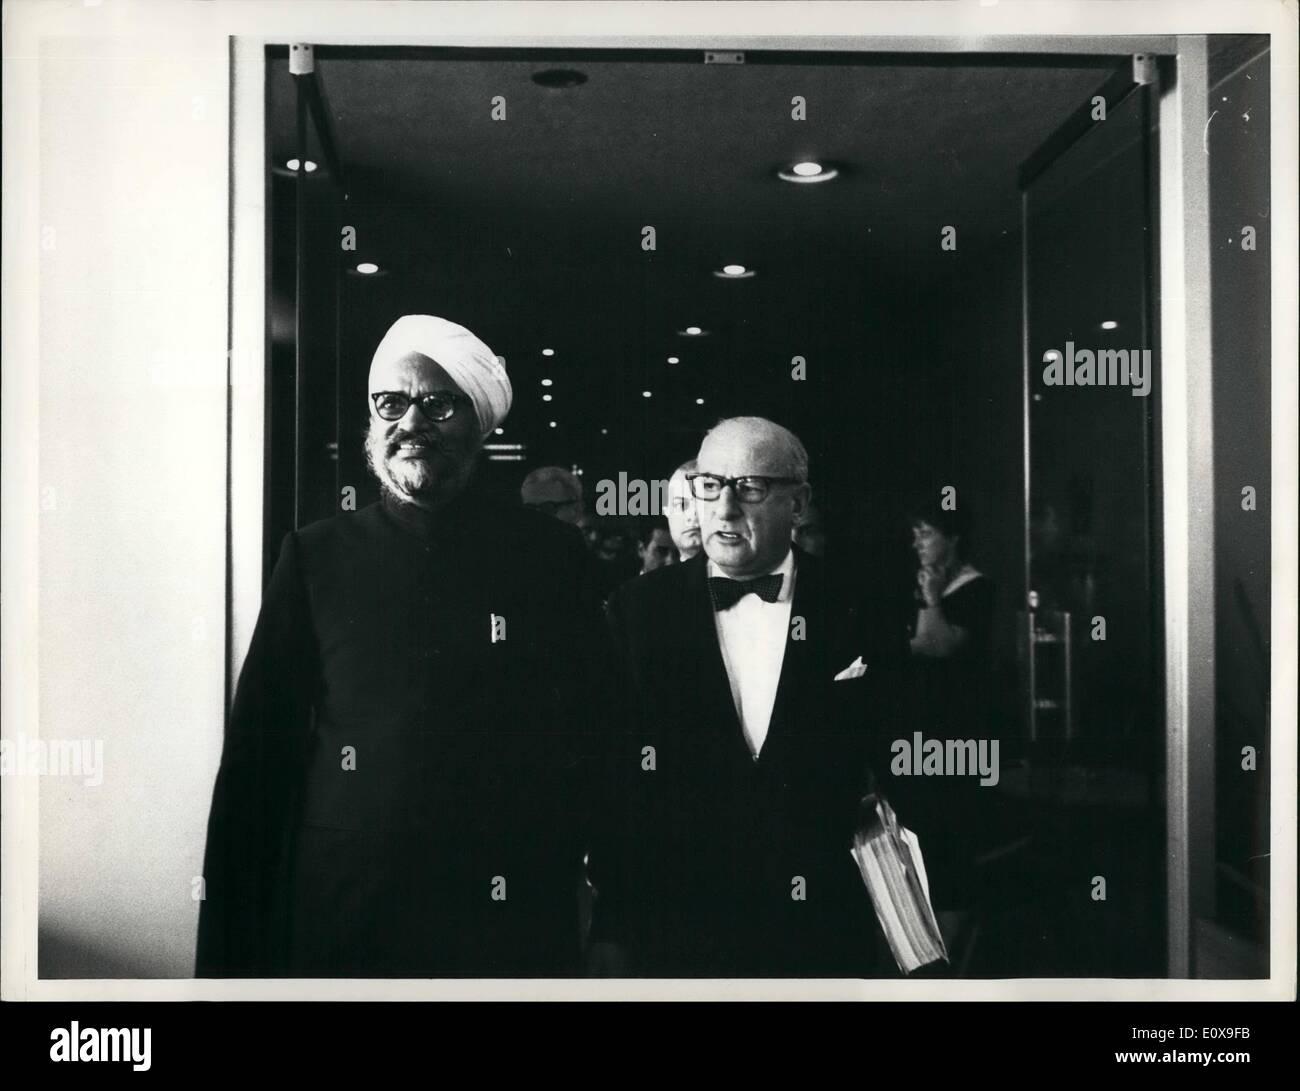 India 1965 Imágenes De Stock & India 1965 Fotos De Stock - Alamy